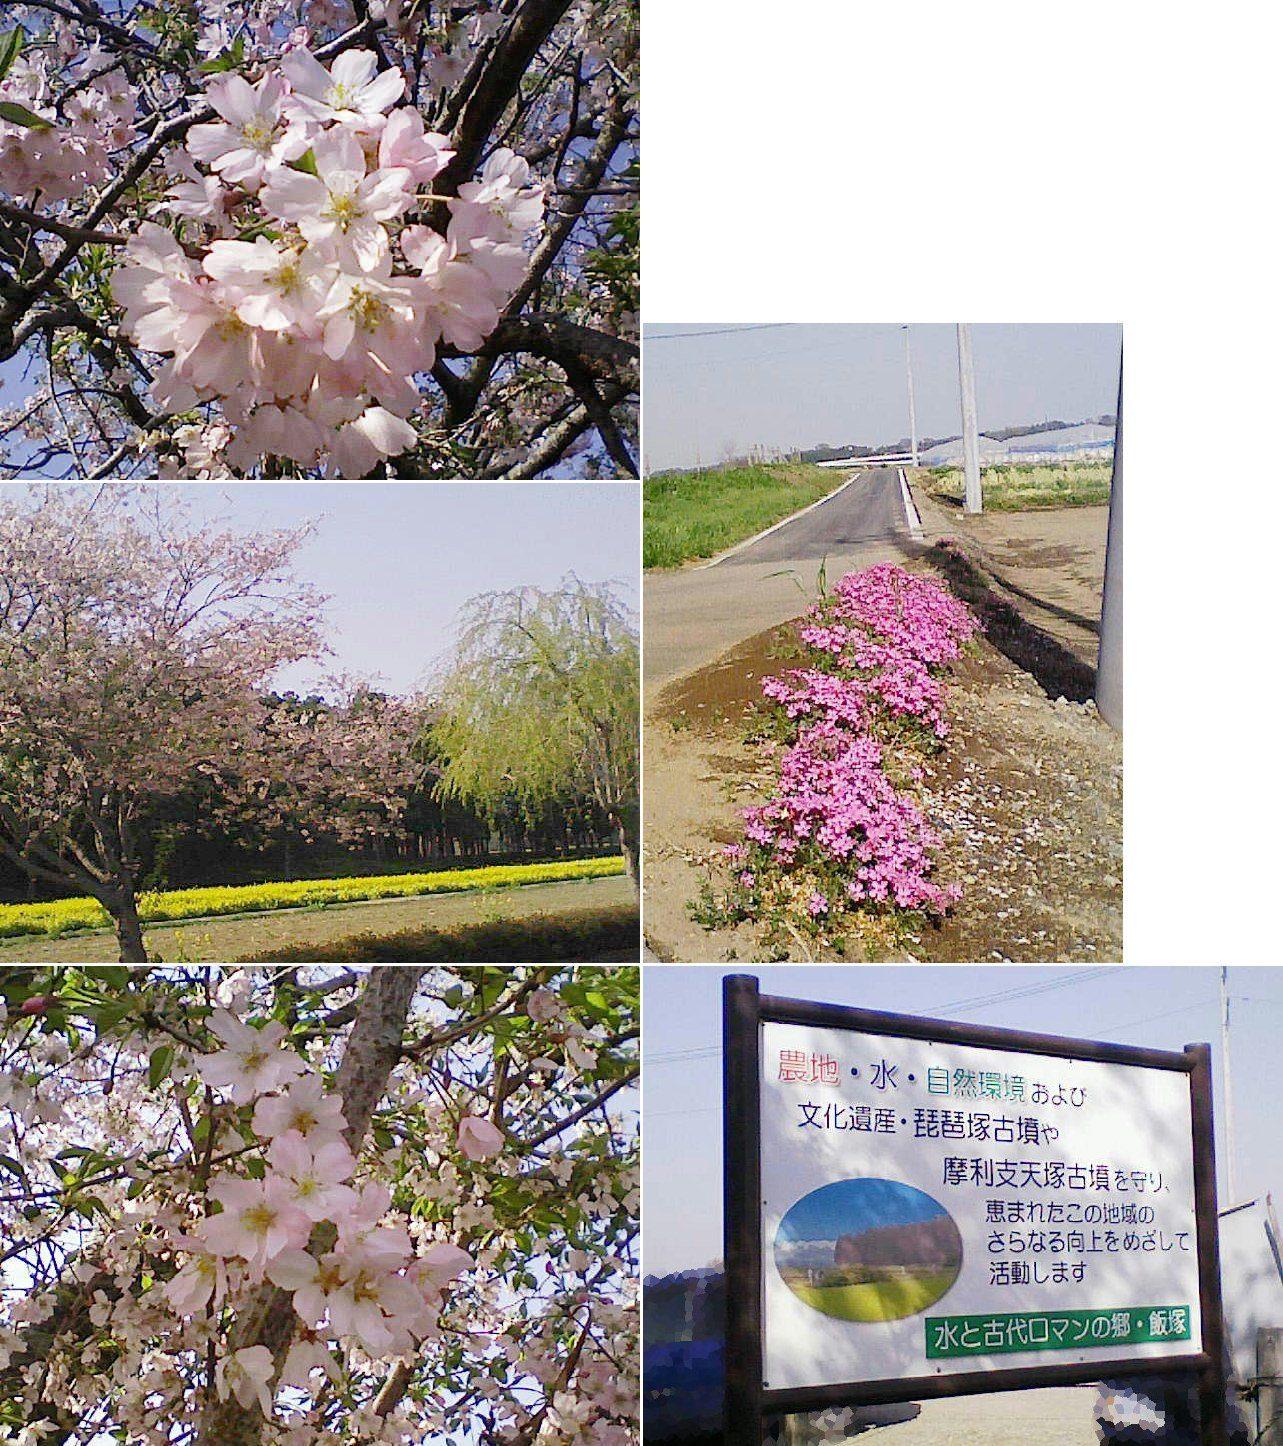 biwatuka2013_19.jpg